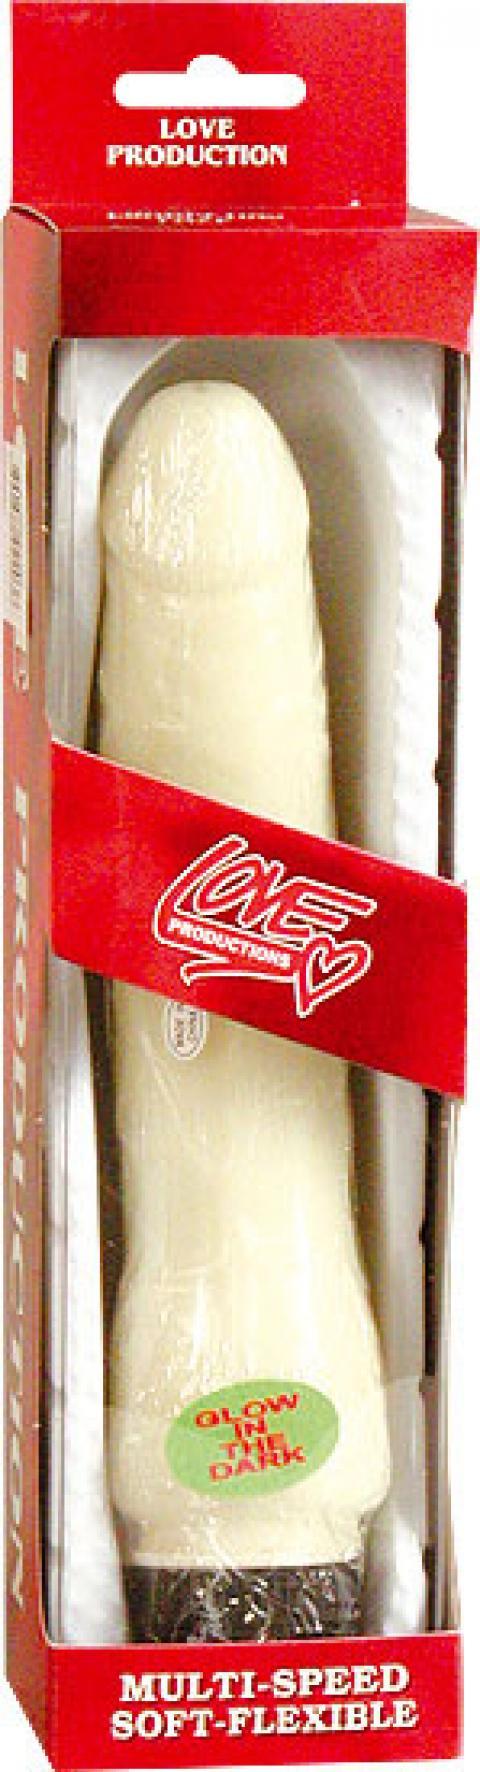 Vibrator Love Production Fosforescent